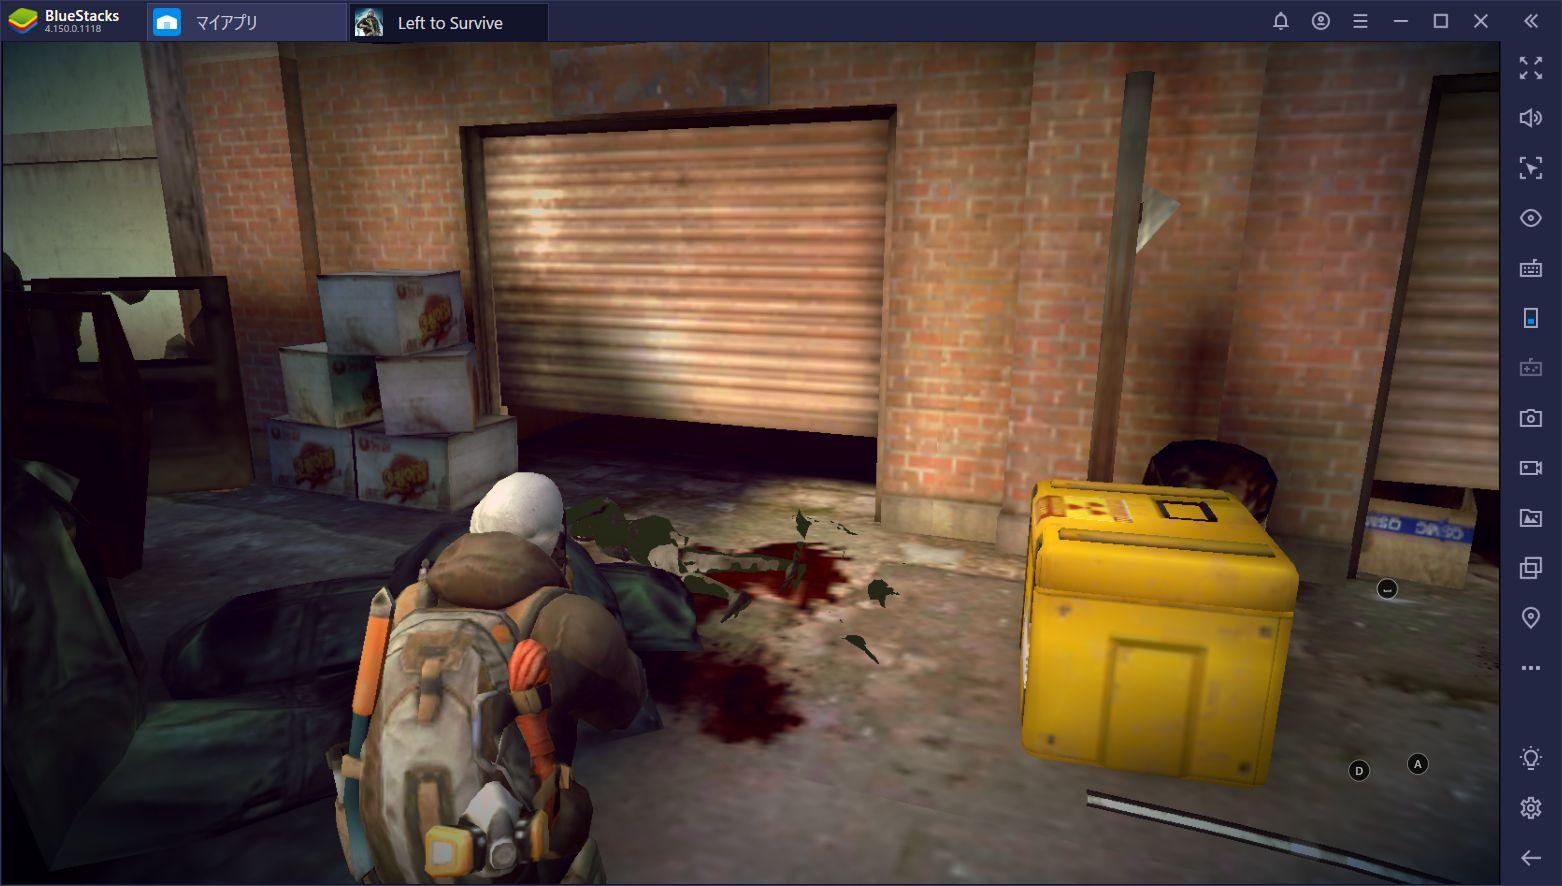 BlueStacksを使ってPCで『Left to Survive: PvPゾンビシューティング』を遊ぼう